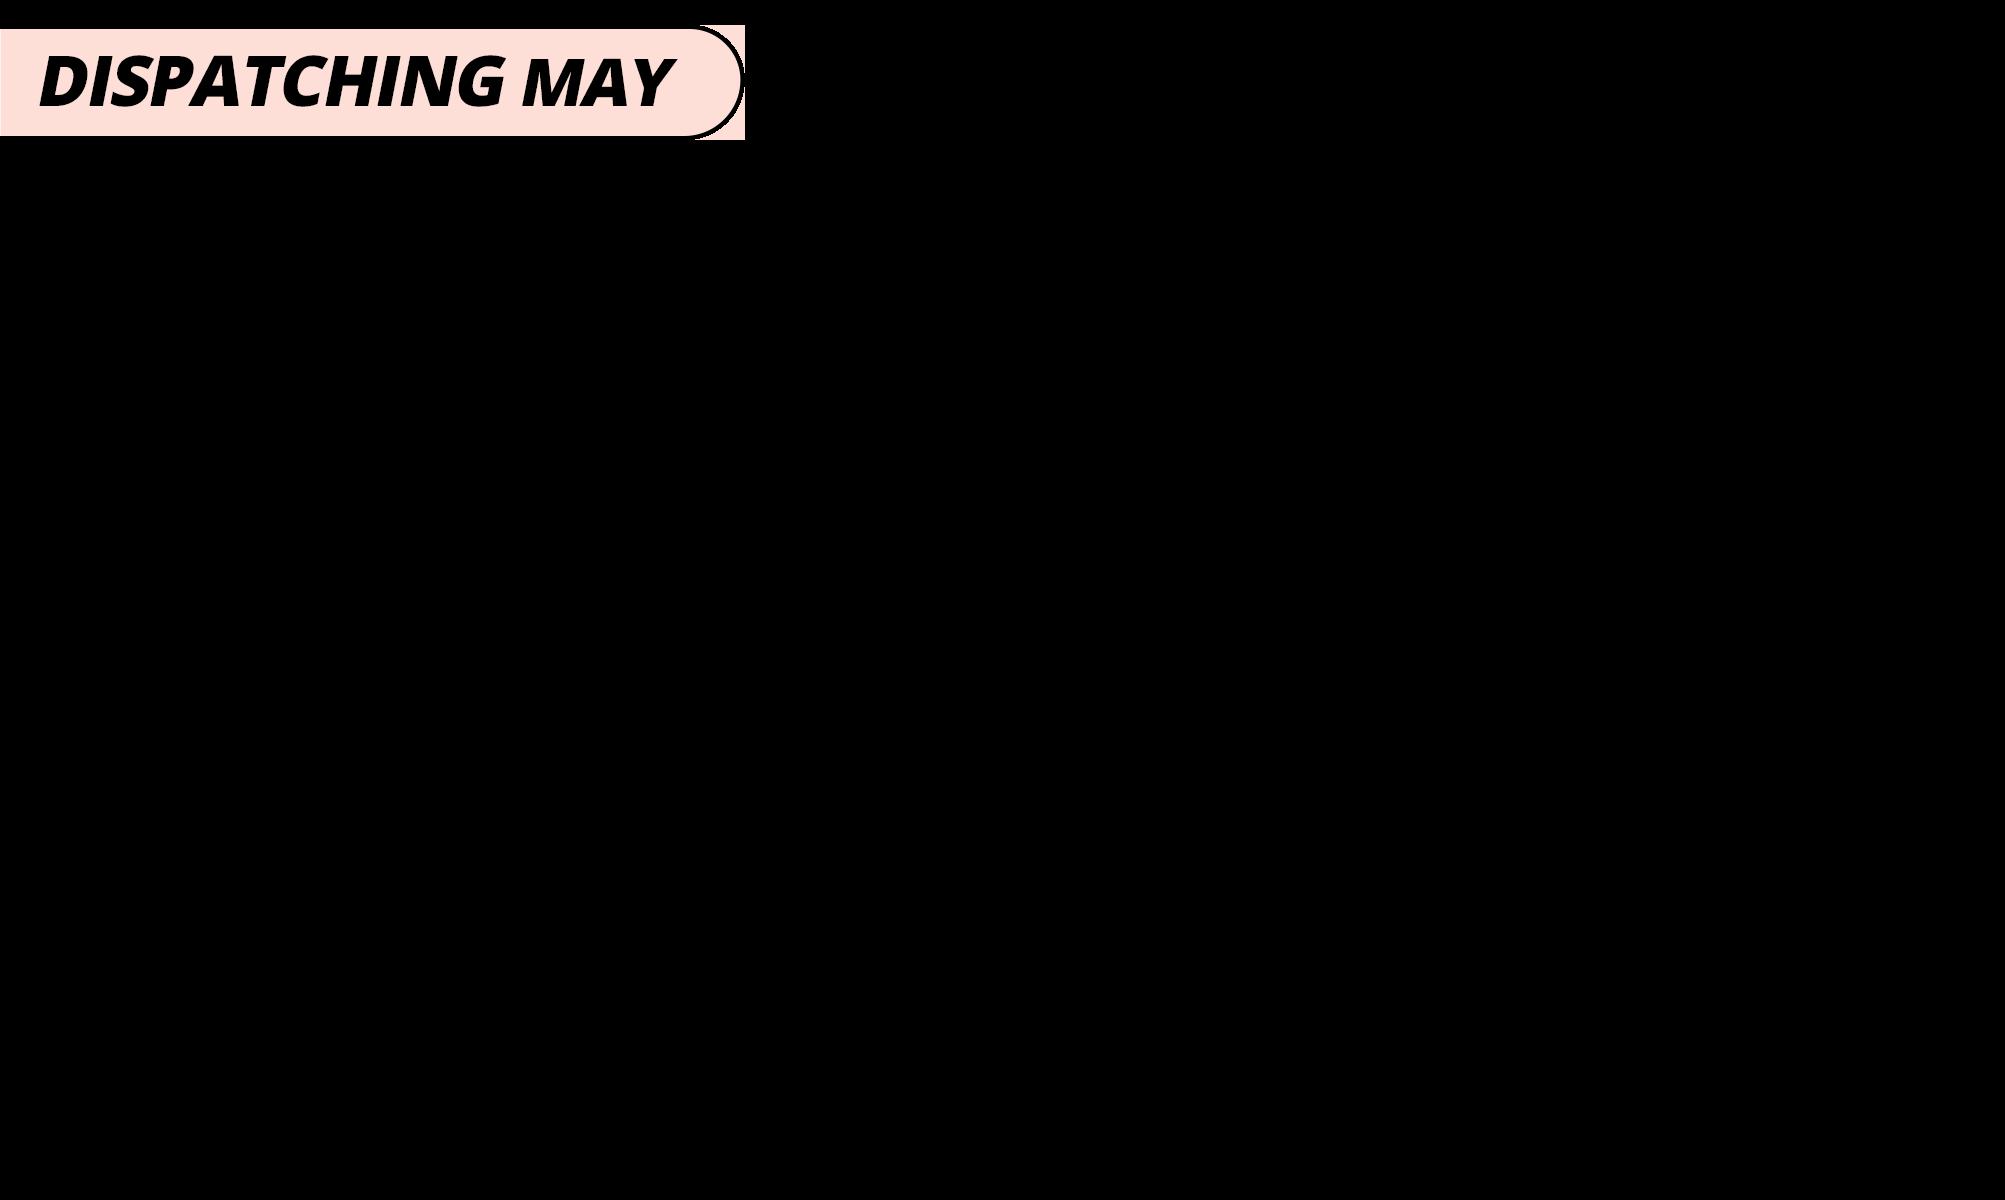 Dispatching may